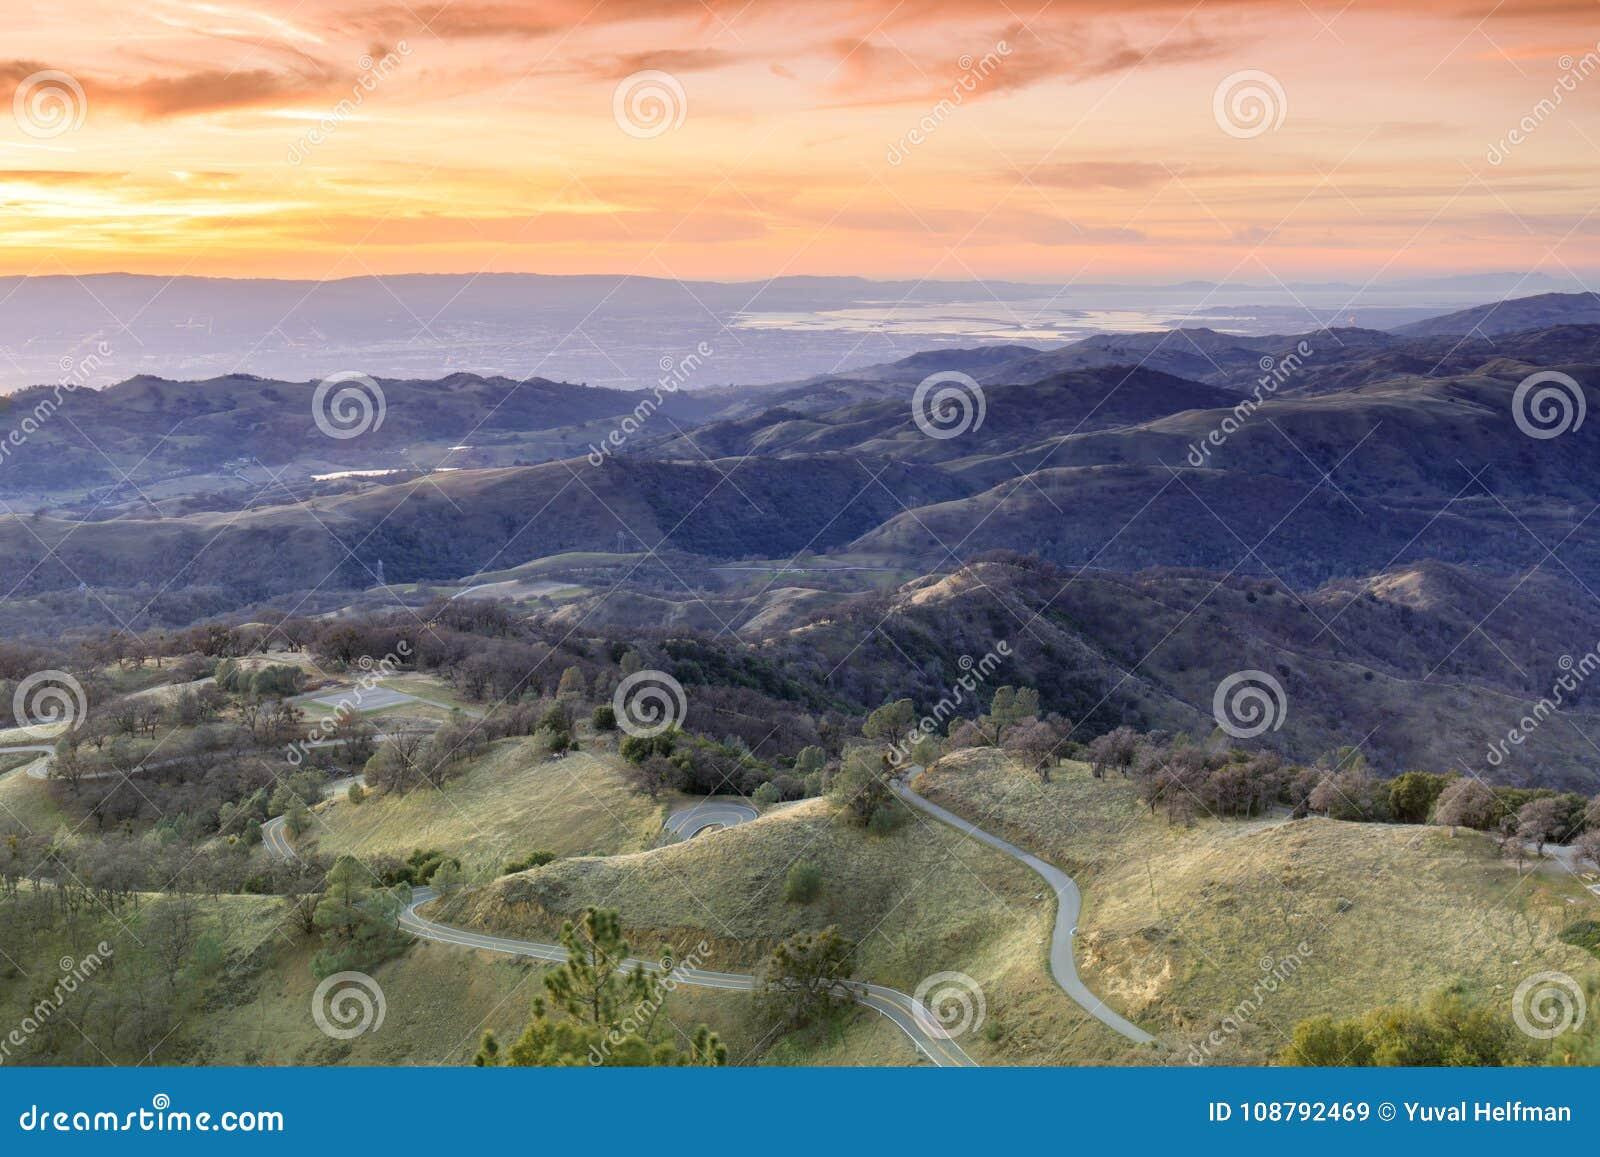 Zet Hamilton Foothills en Santa Clara Valley Sunset op